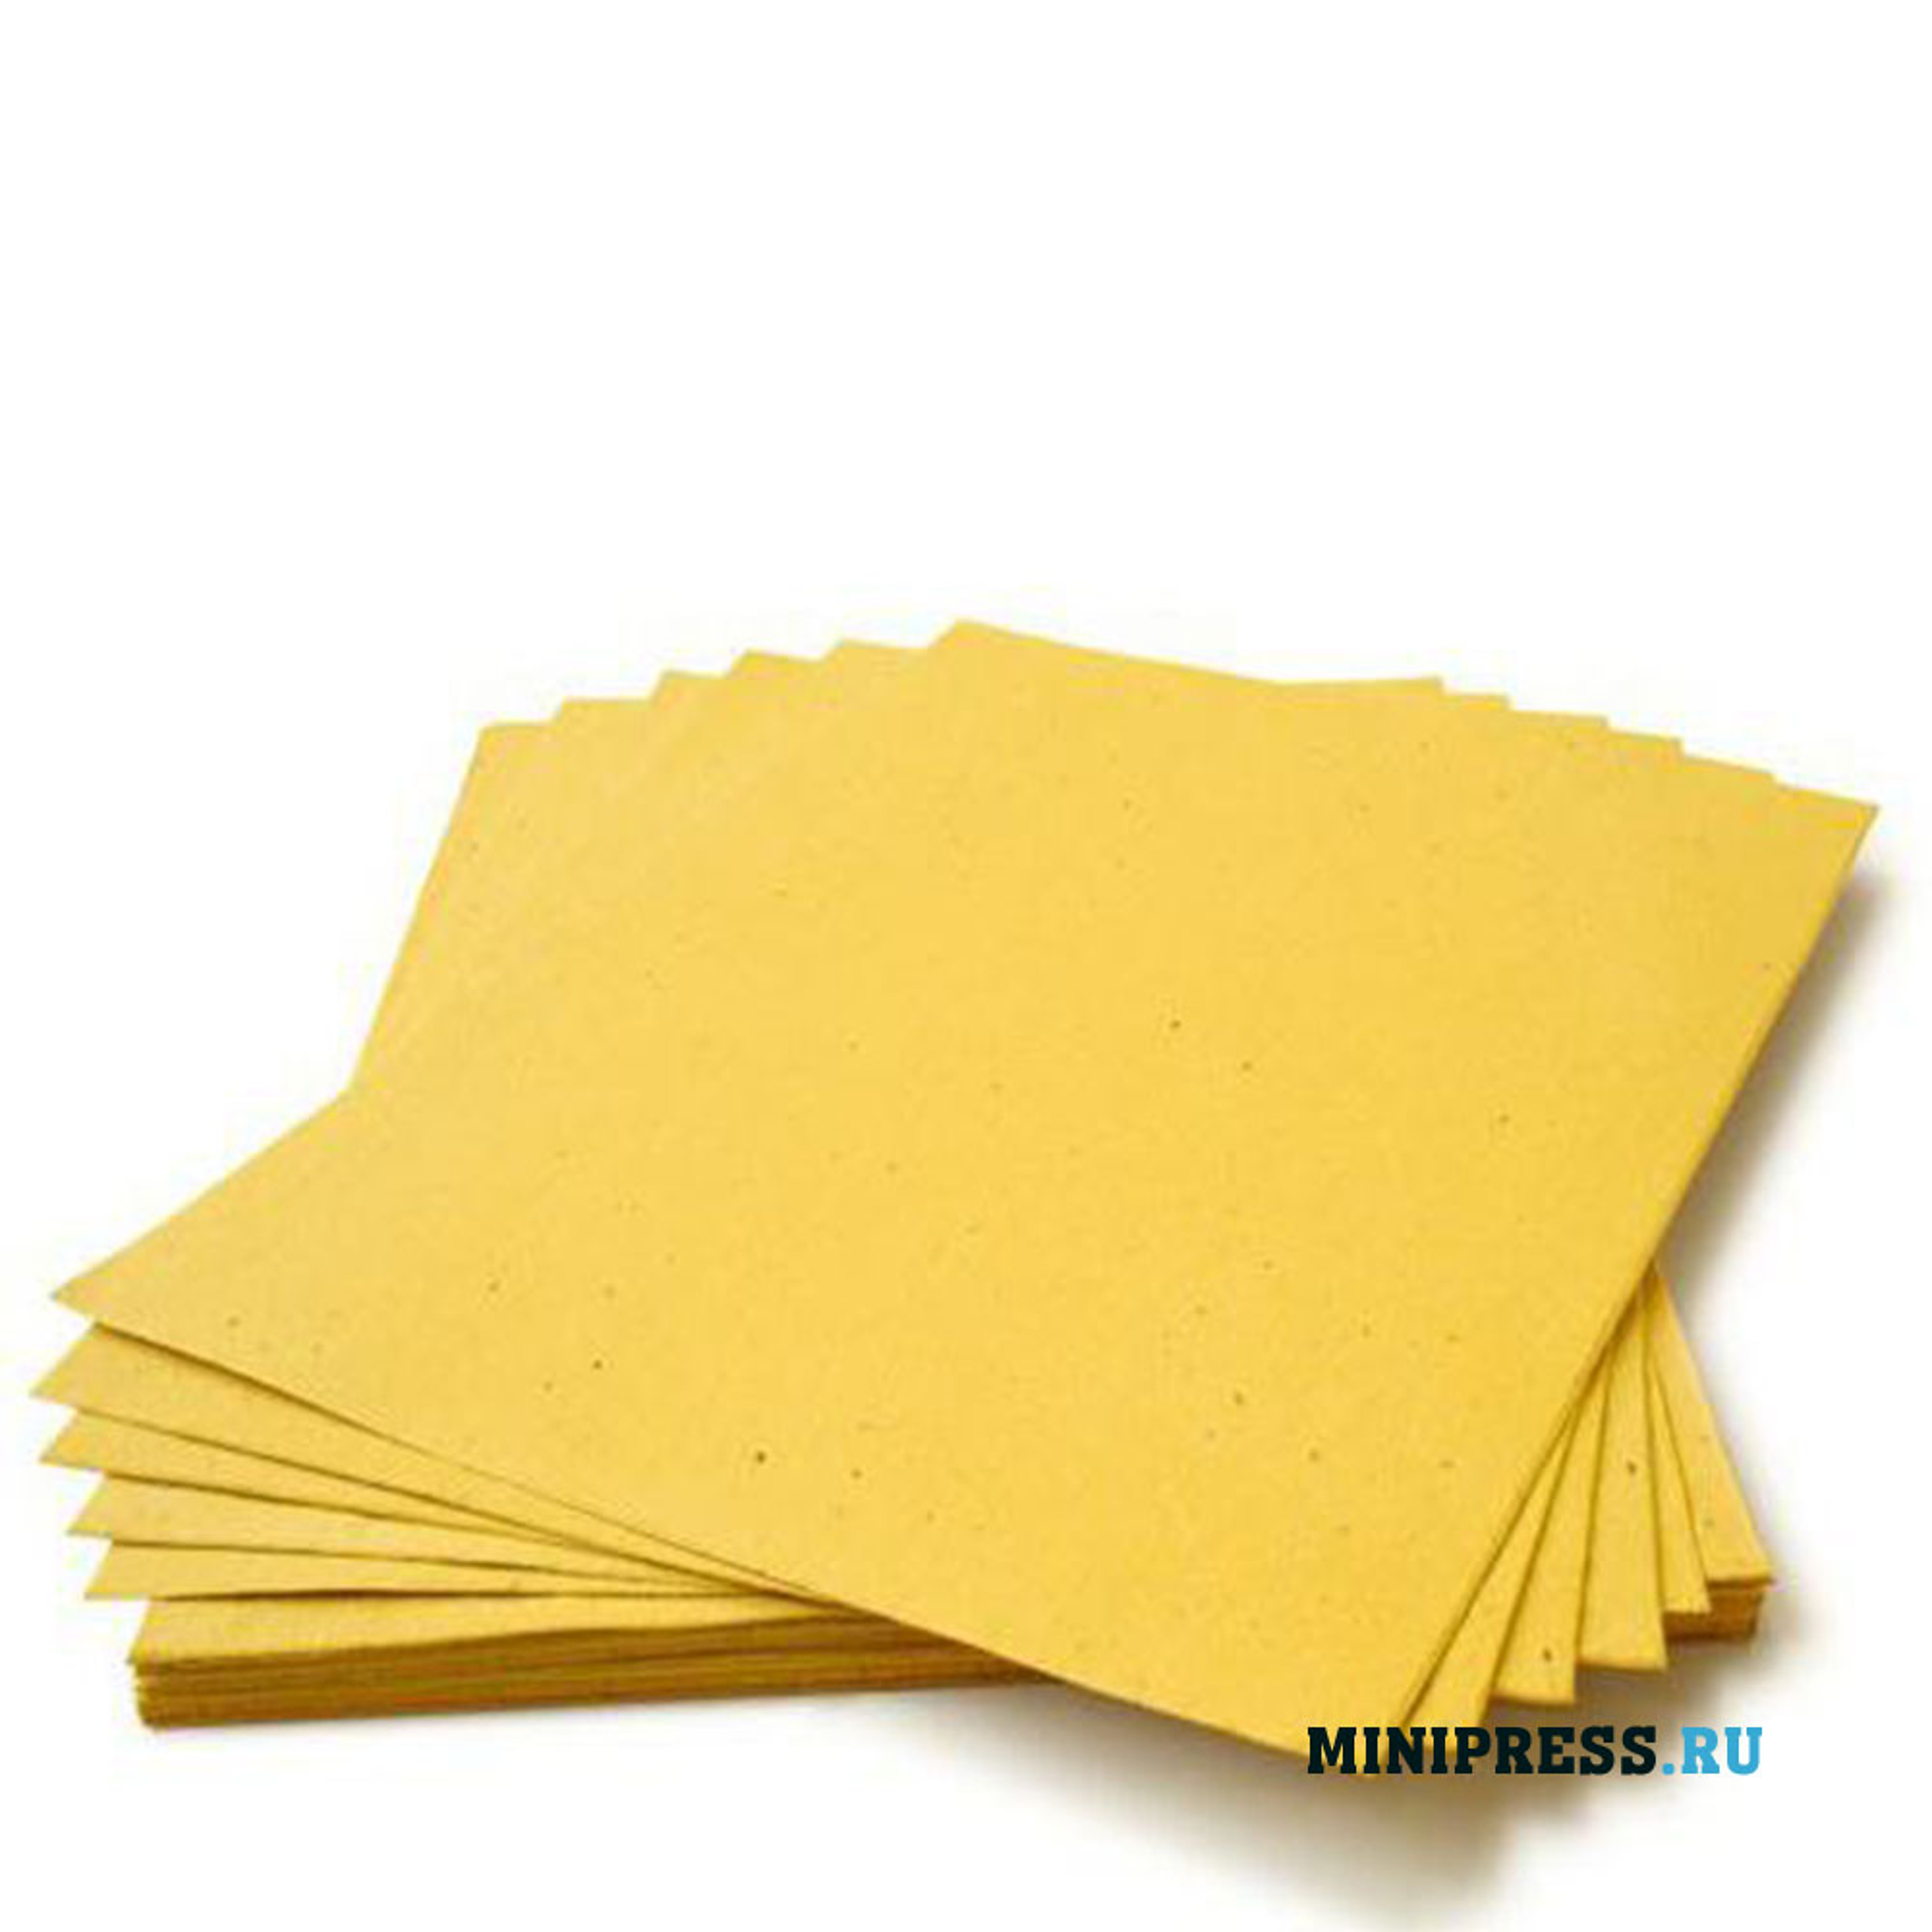 Производство горчичников